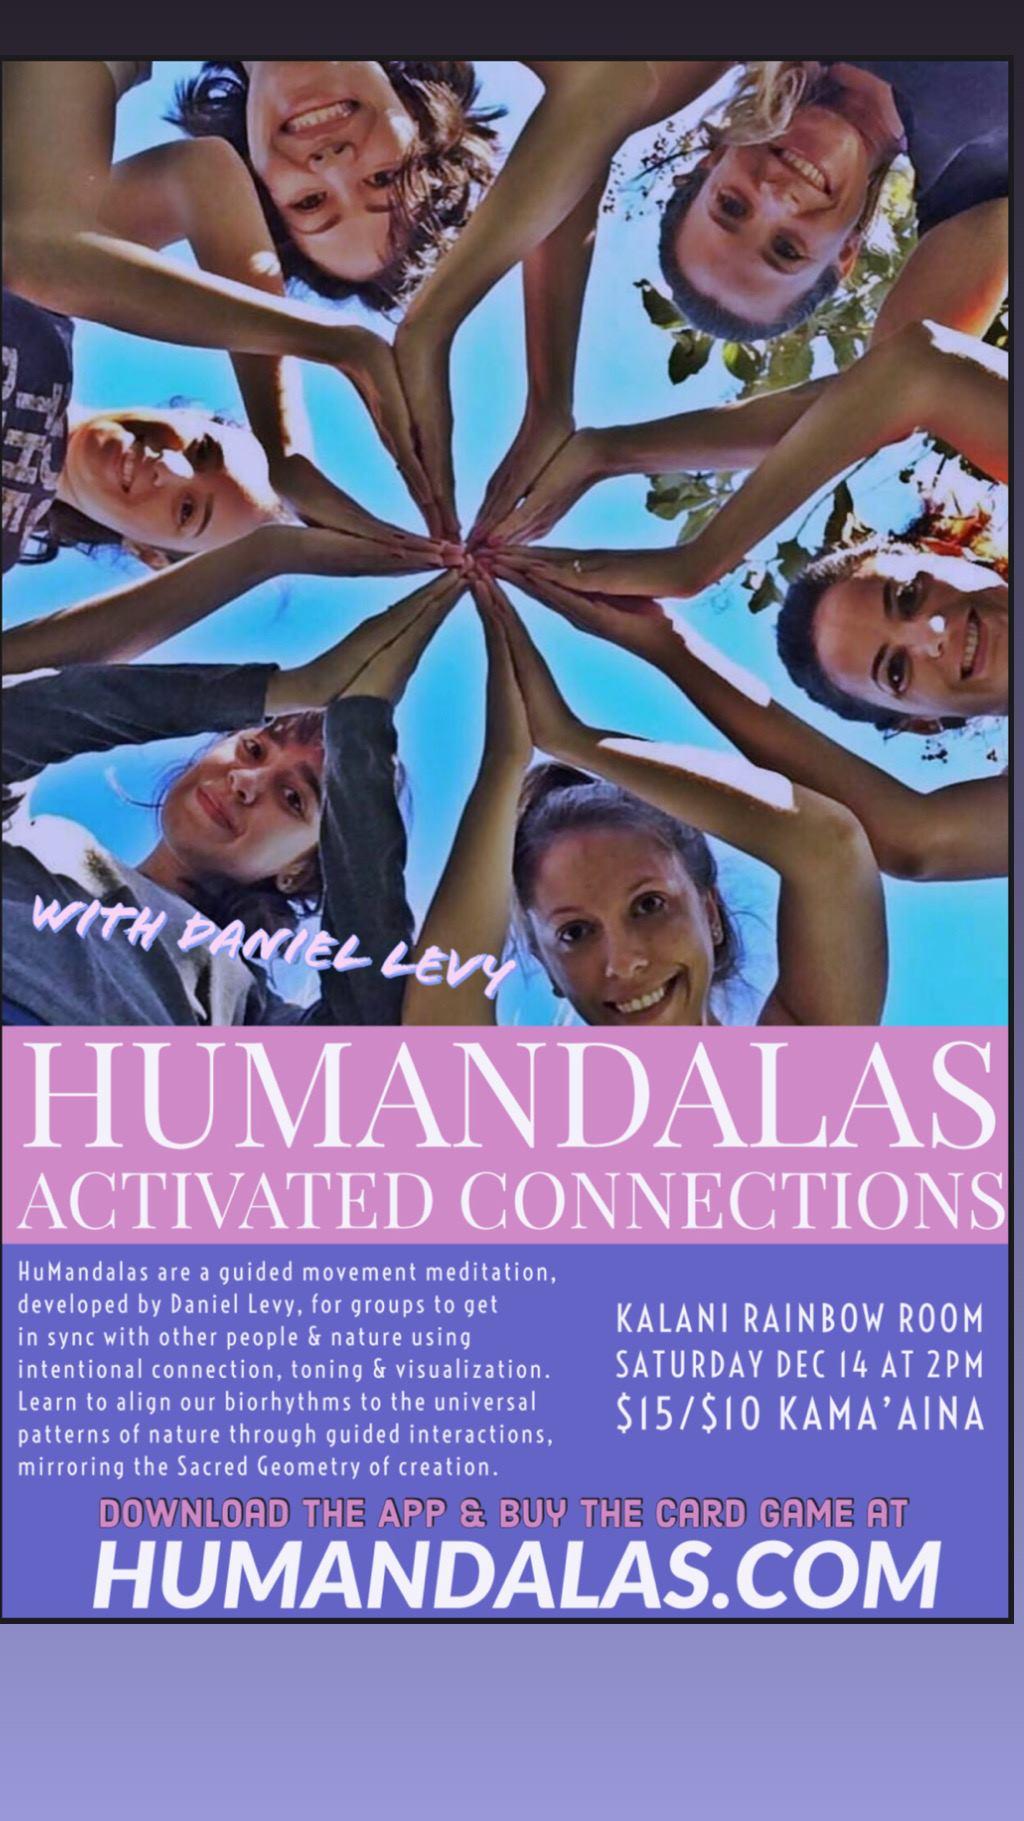 Humandalas at Kalani